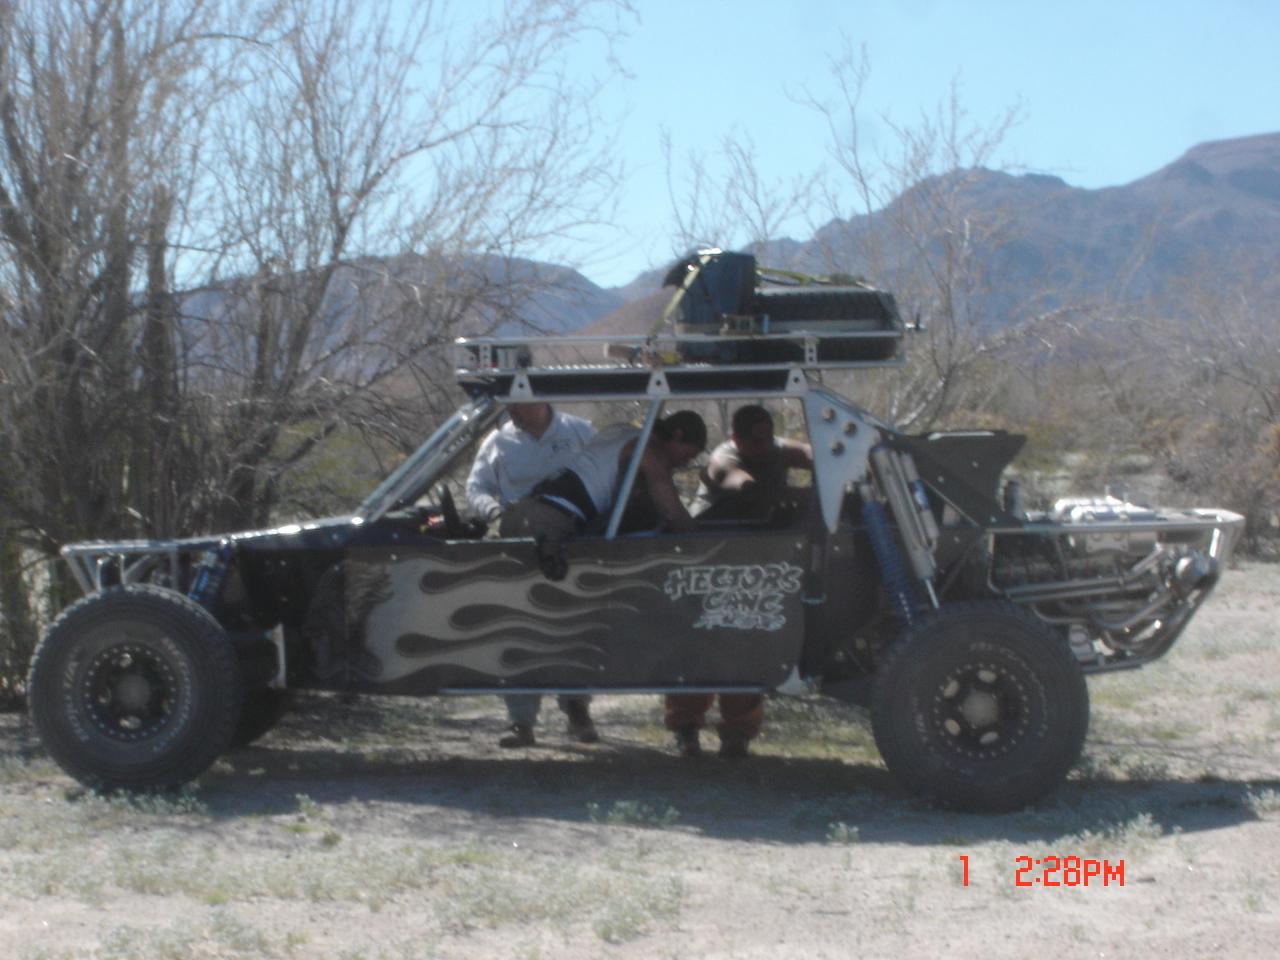 Hector's Gang Pre Run Baja 250 2008 Just Past Matomi Was